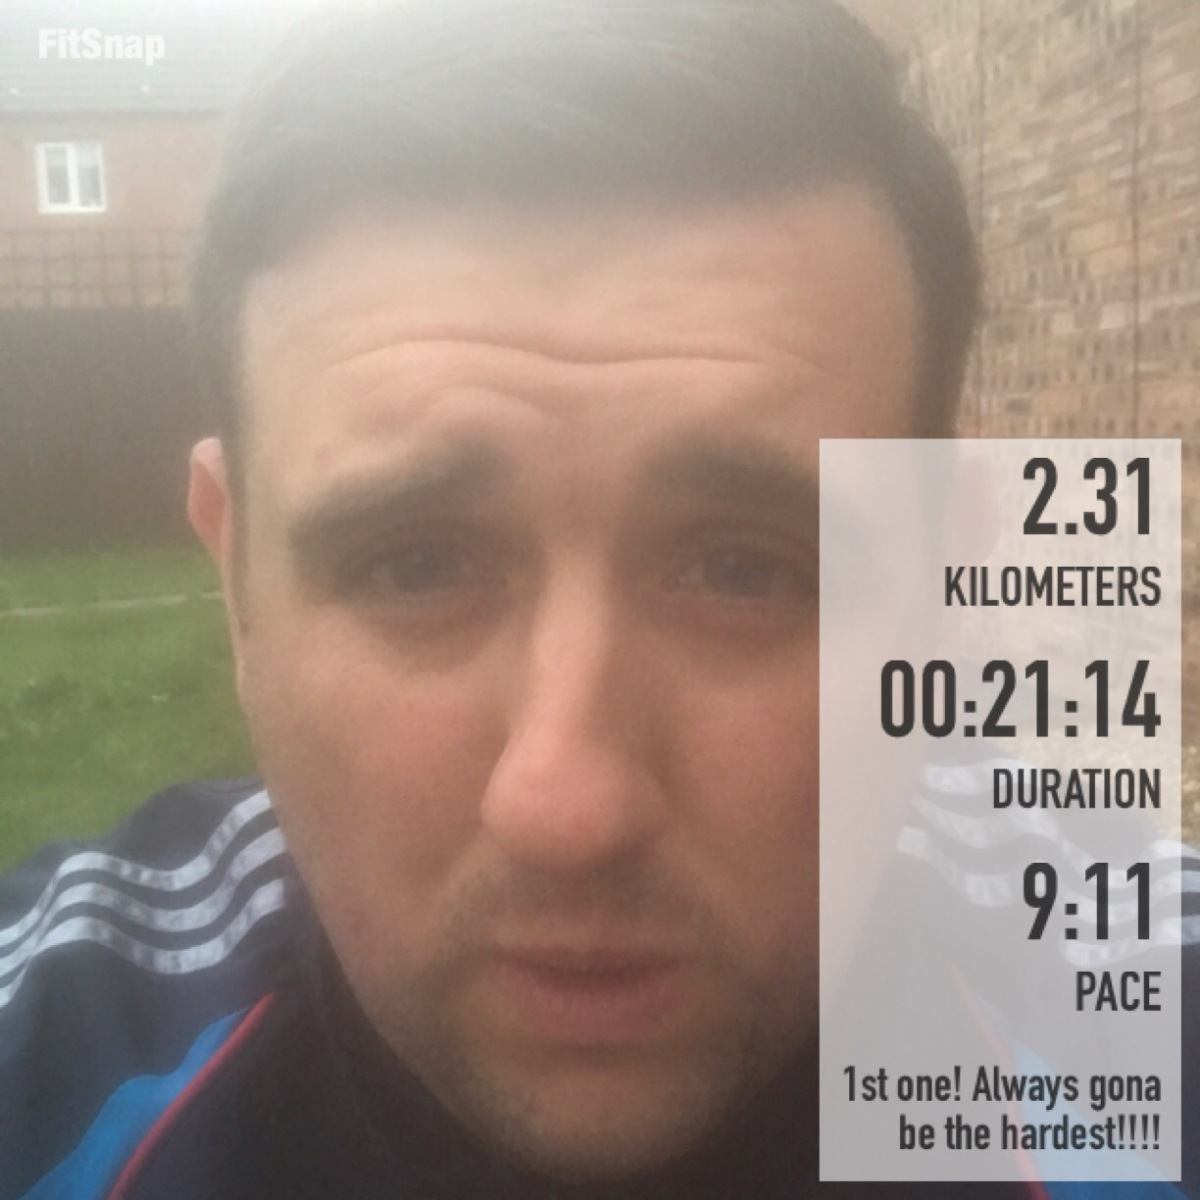 Week 1 of my MarathonTraining